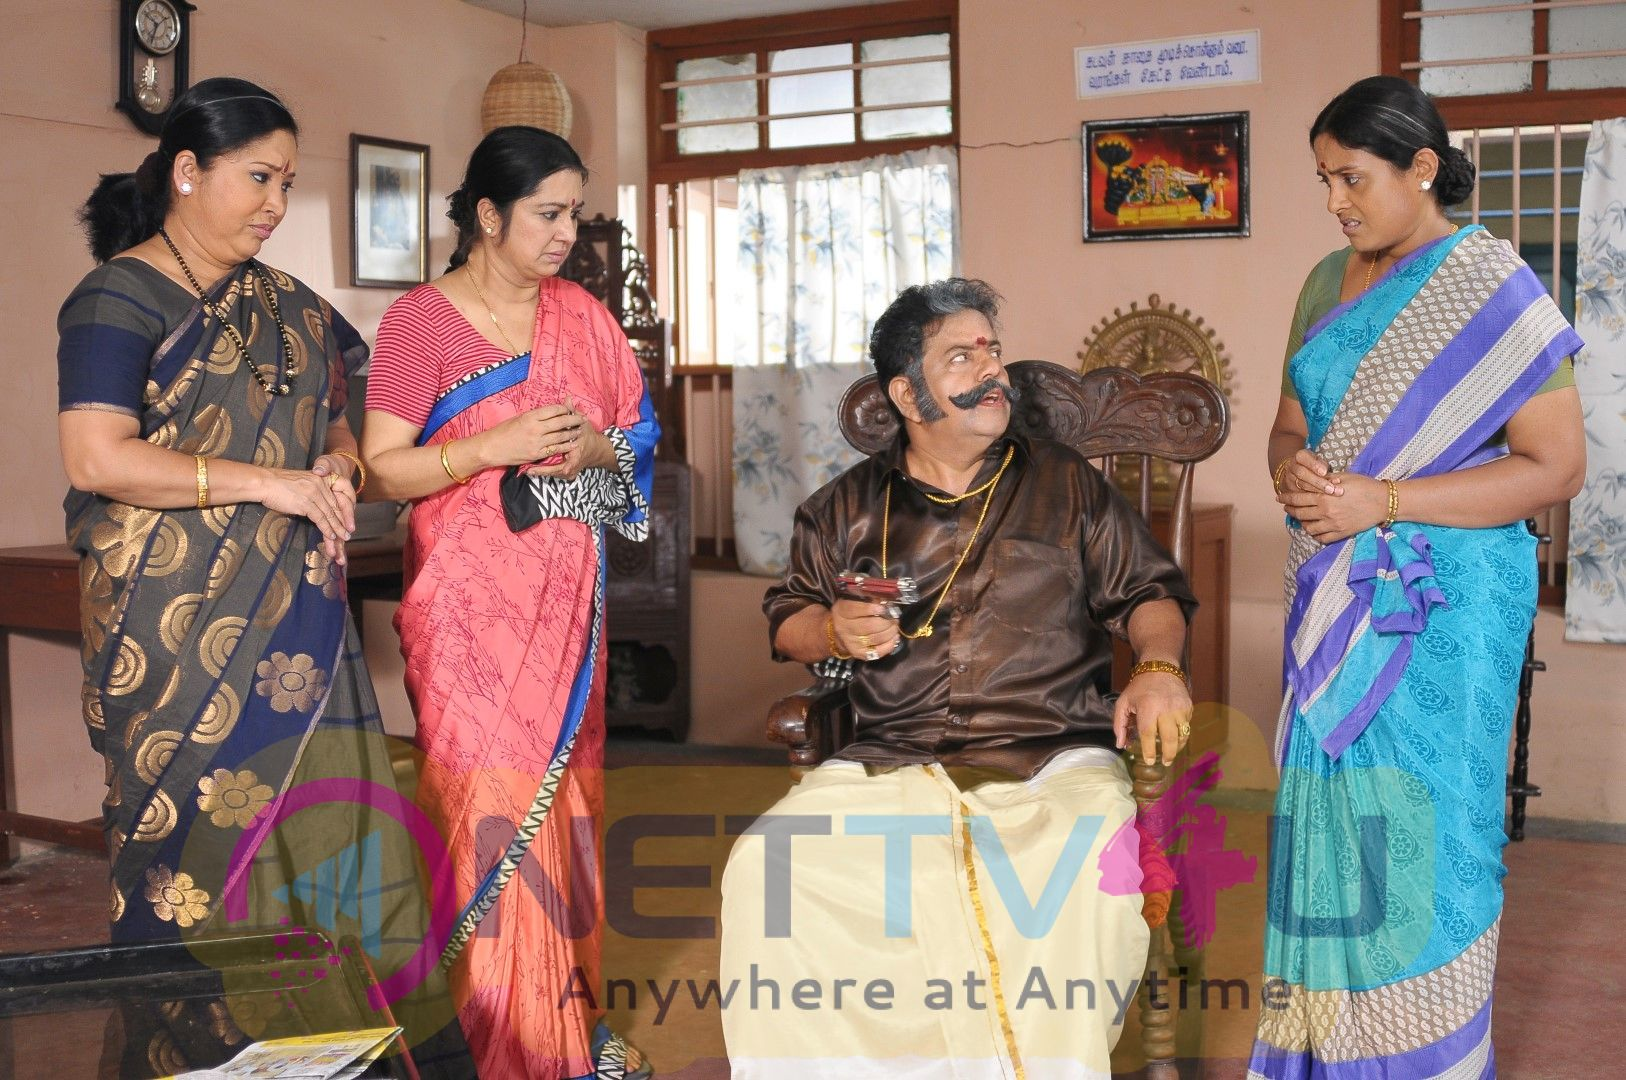 Idly Tamil Movie Realeasing Worldwide On June 29 Exclusive Stills